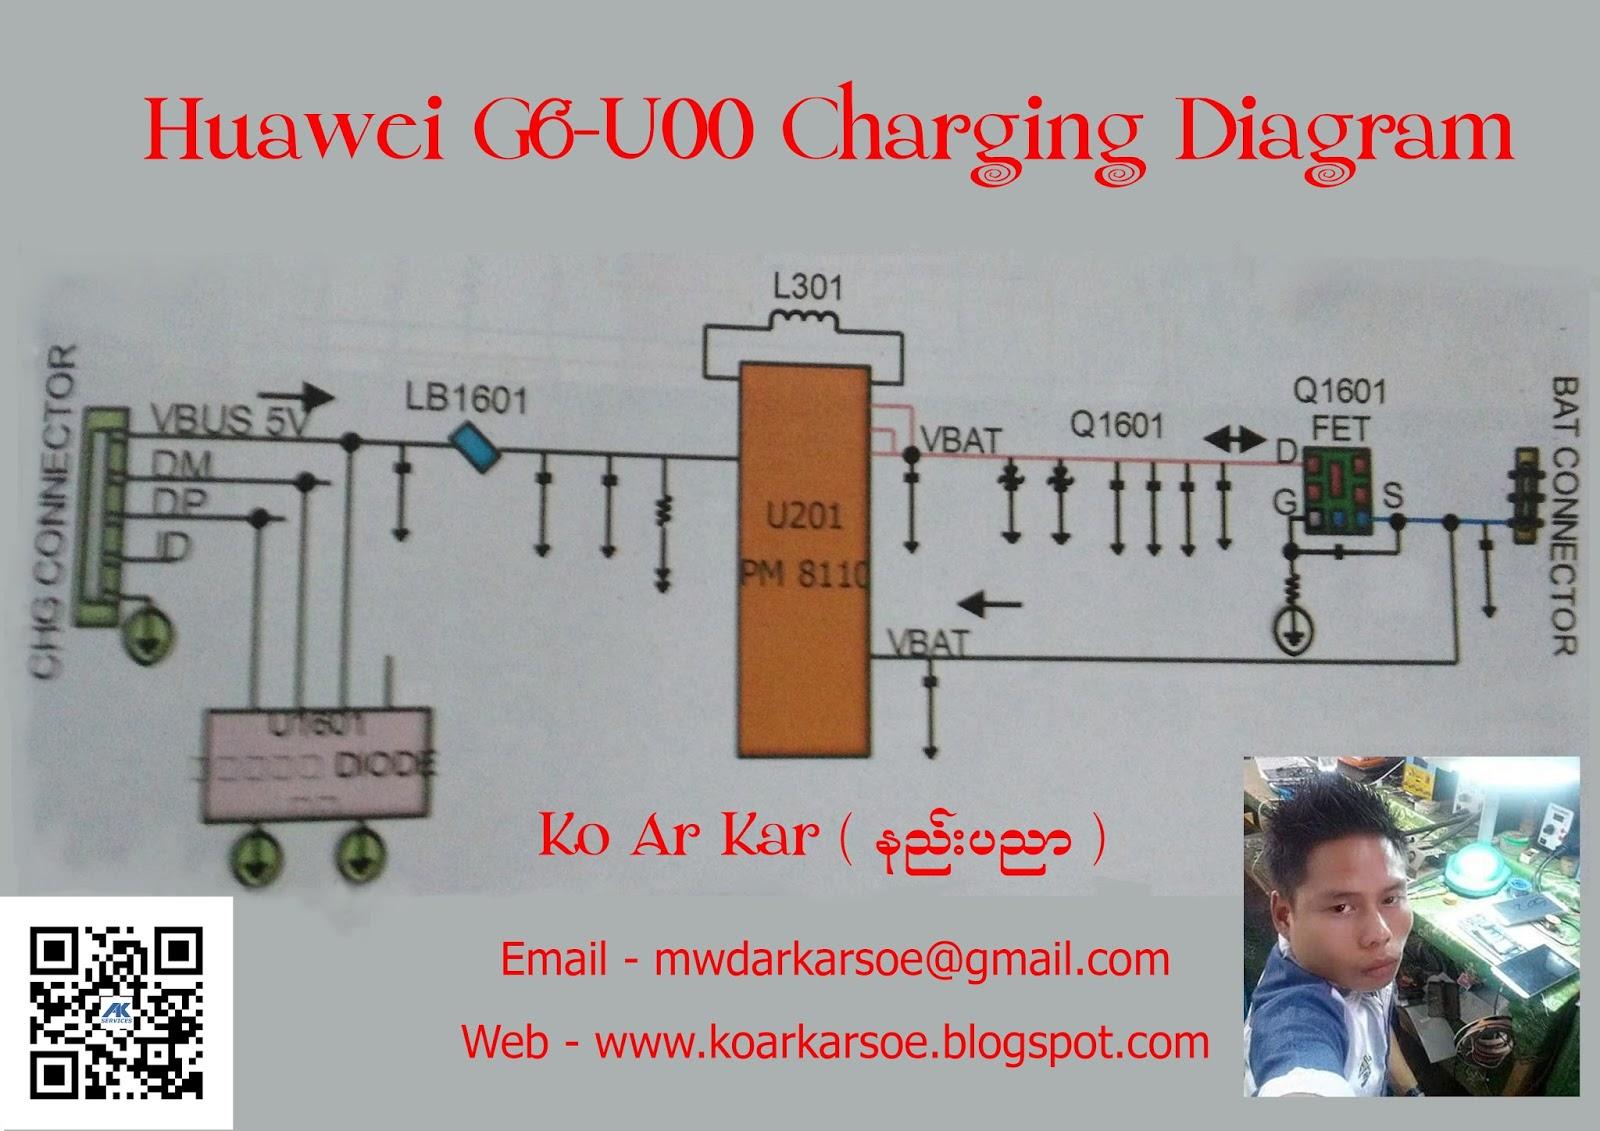 PM8110 Power Ic သံုး Huawei G6 , C8816 တို႔၏ Charging Error ~ ကိုအာကာ